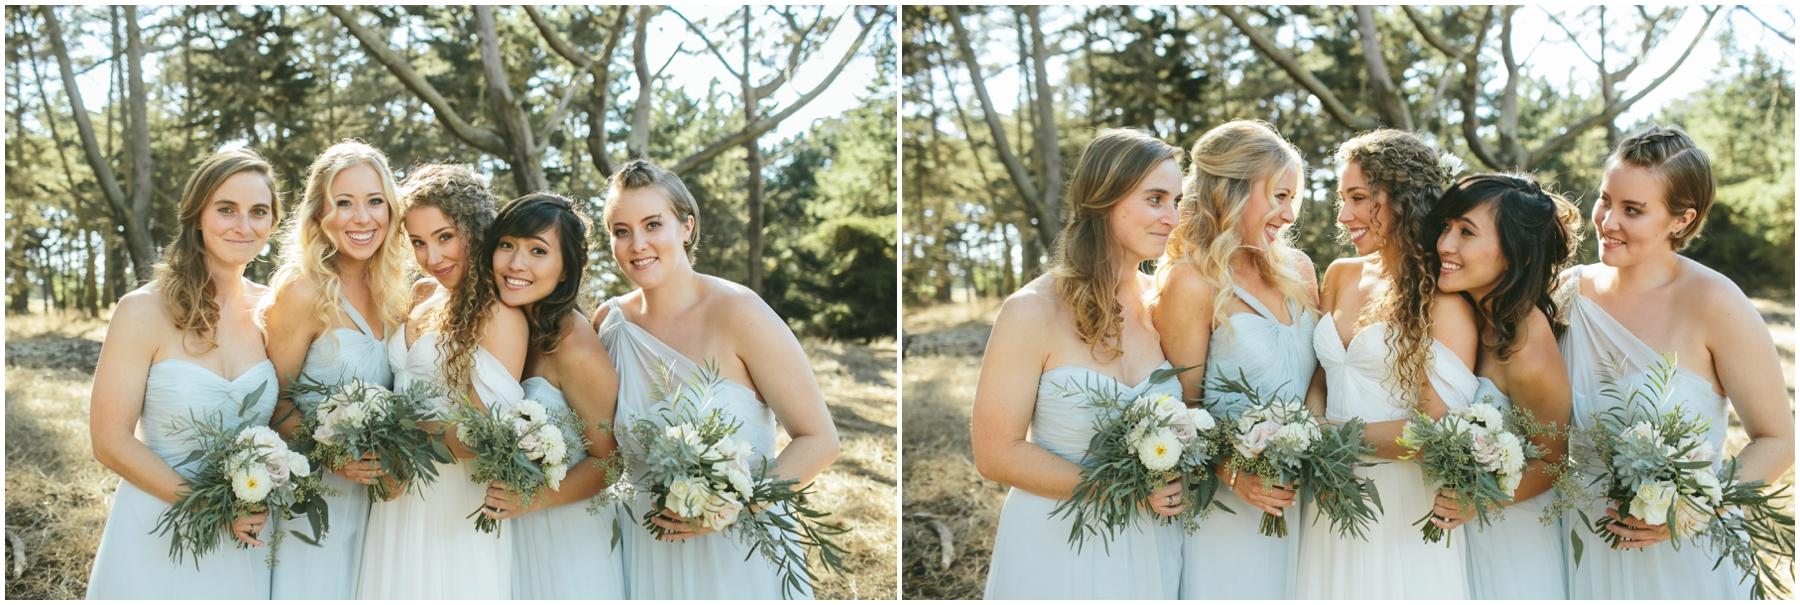 Emily+Paul-WEDDING_KellyBoitanoPhotography_0066